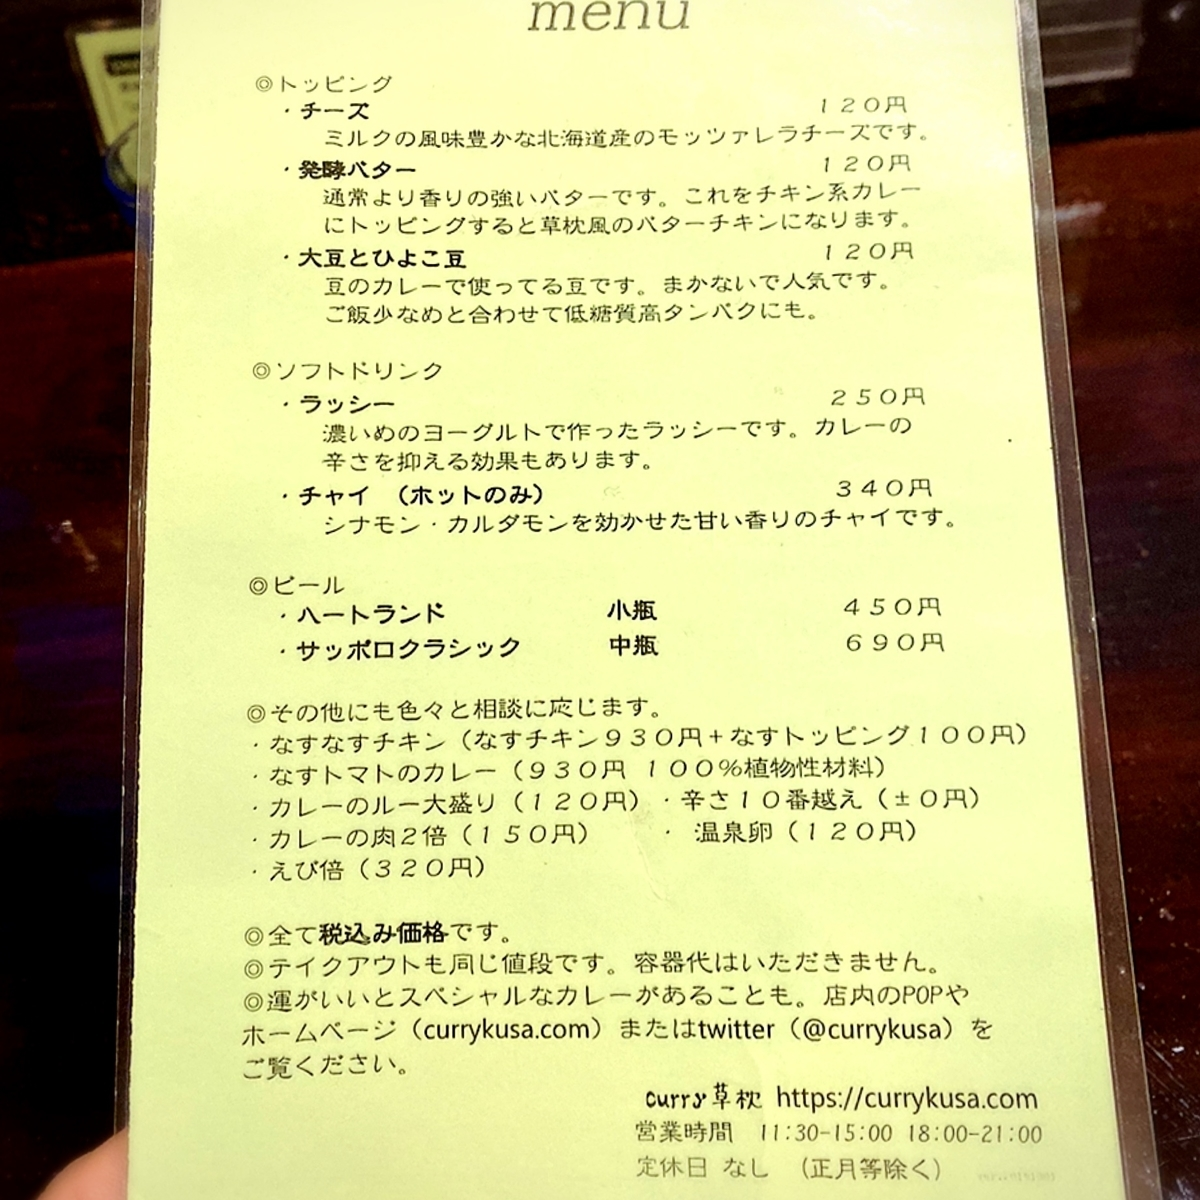 「curry 草枕」のメニューと値段2